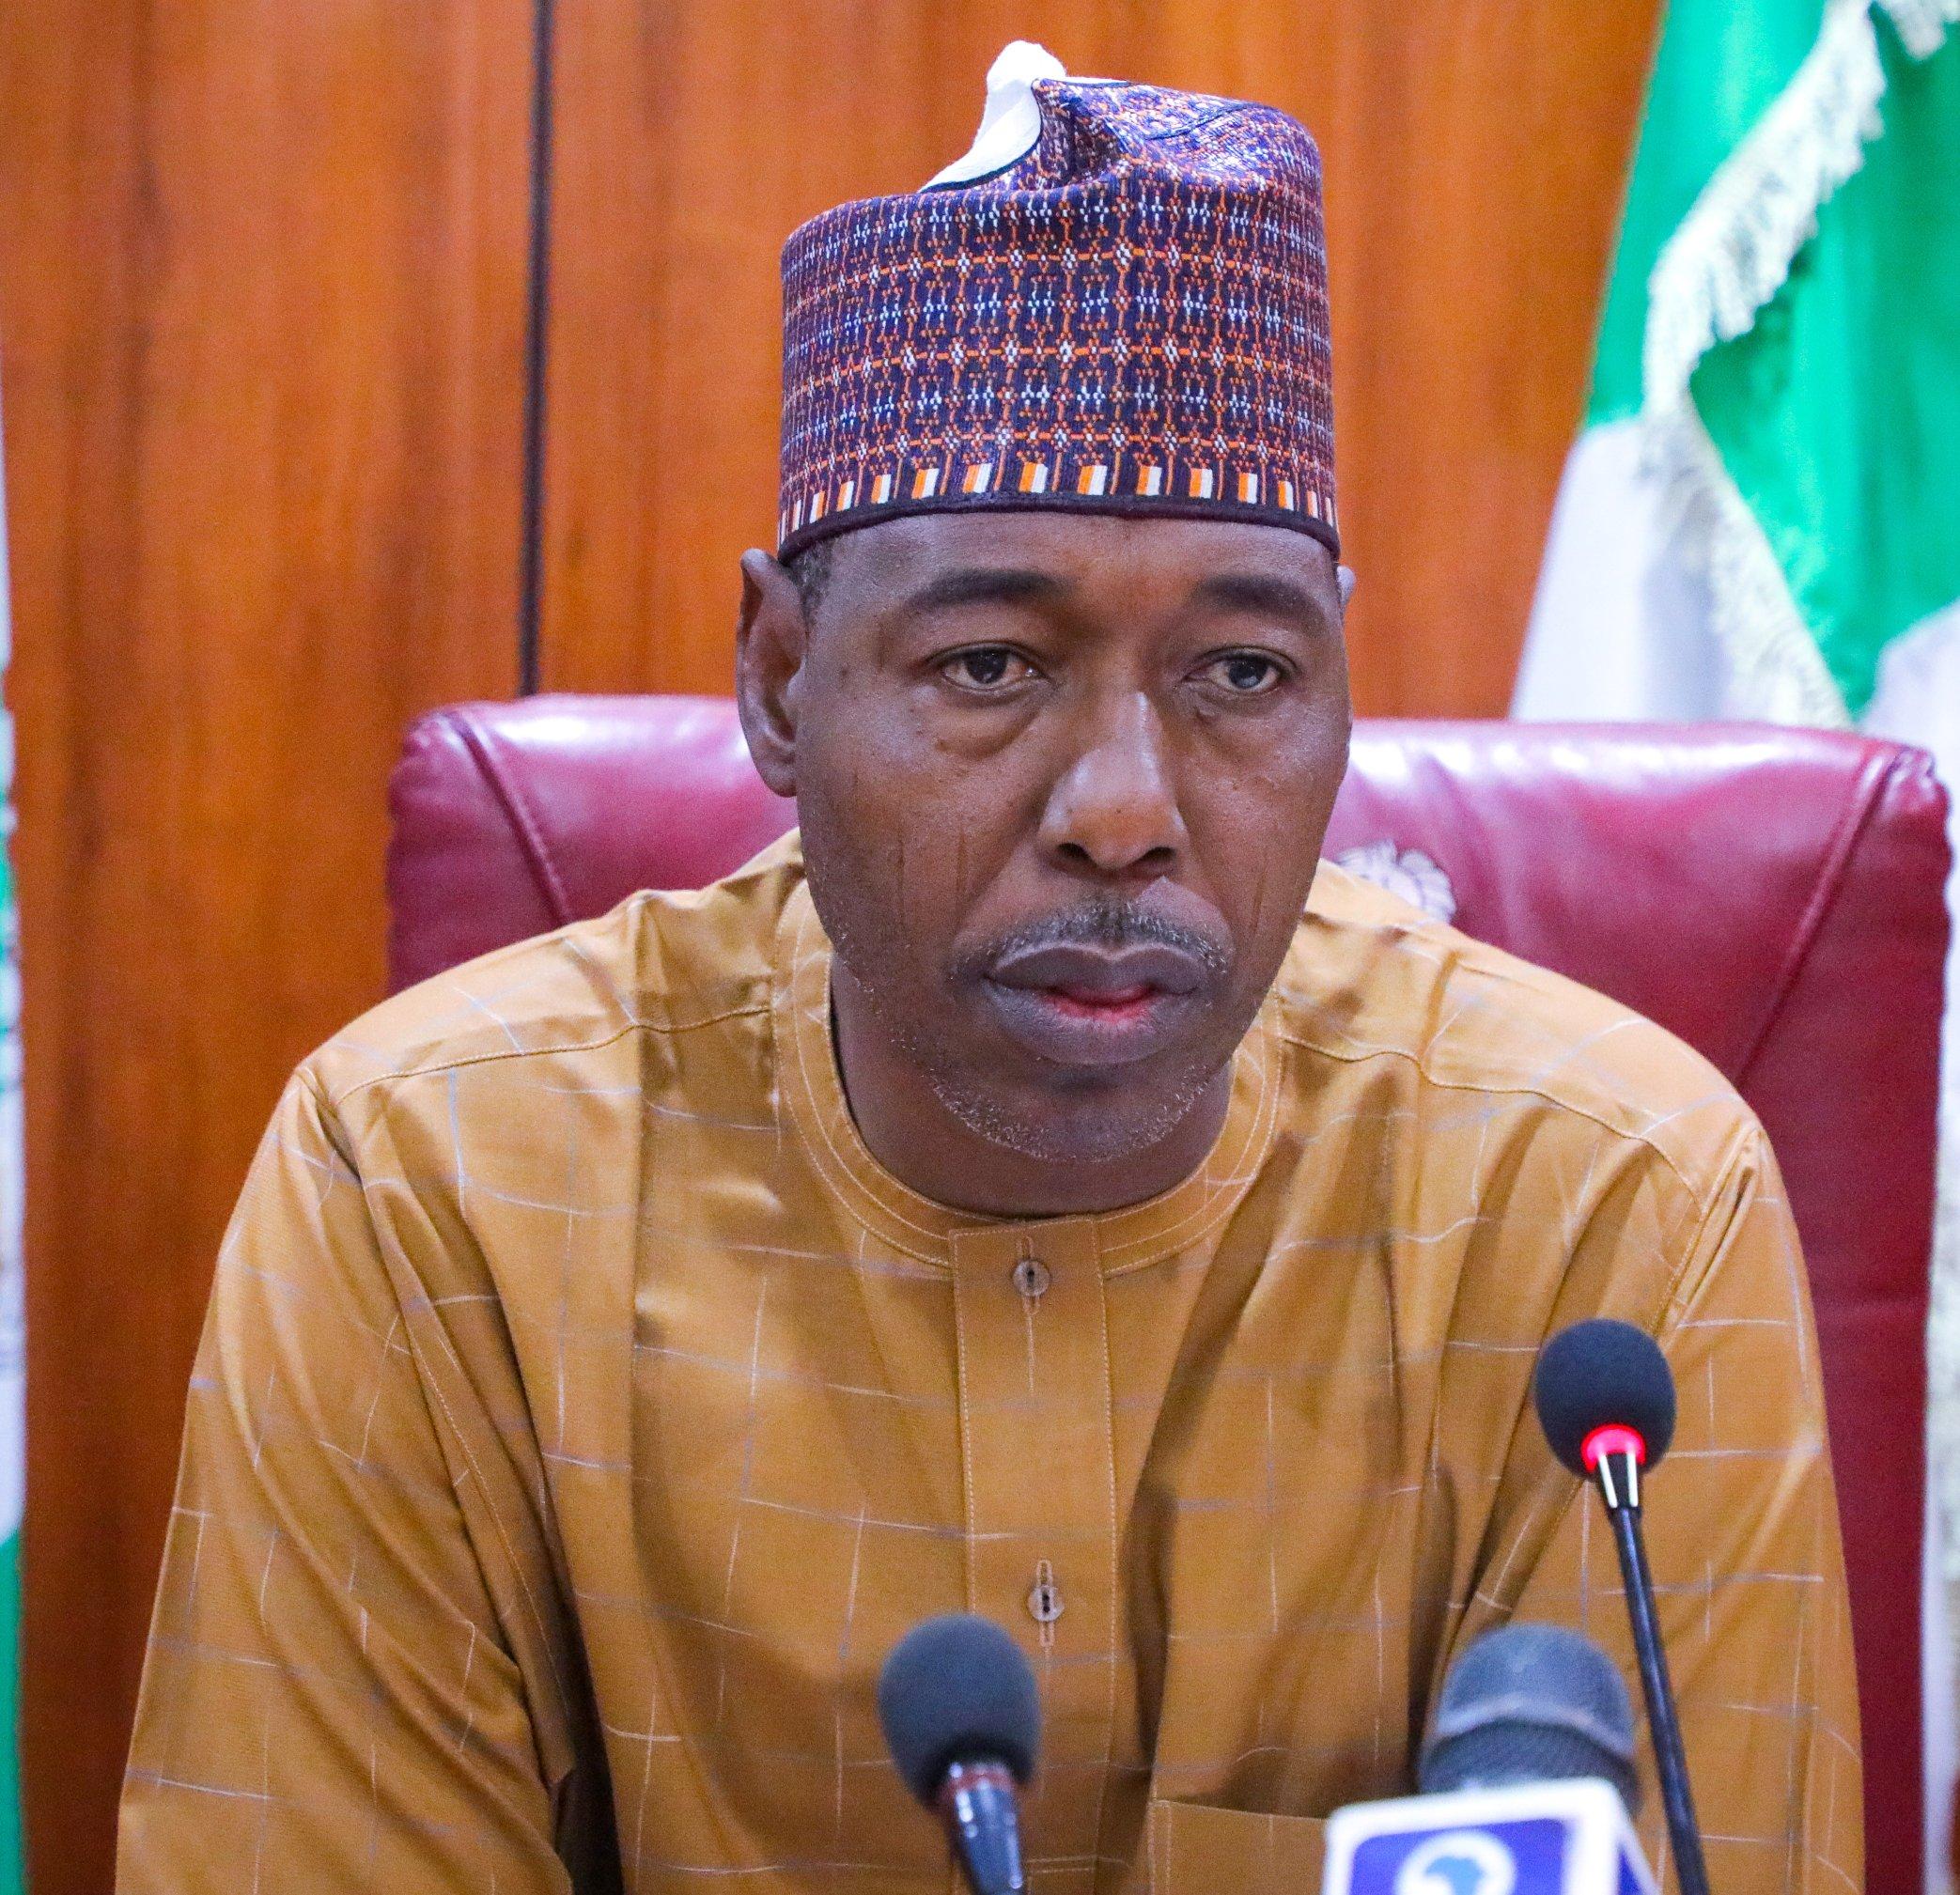 Borno State governor, Prof Babagana Umara Zulum